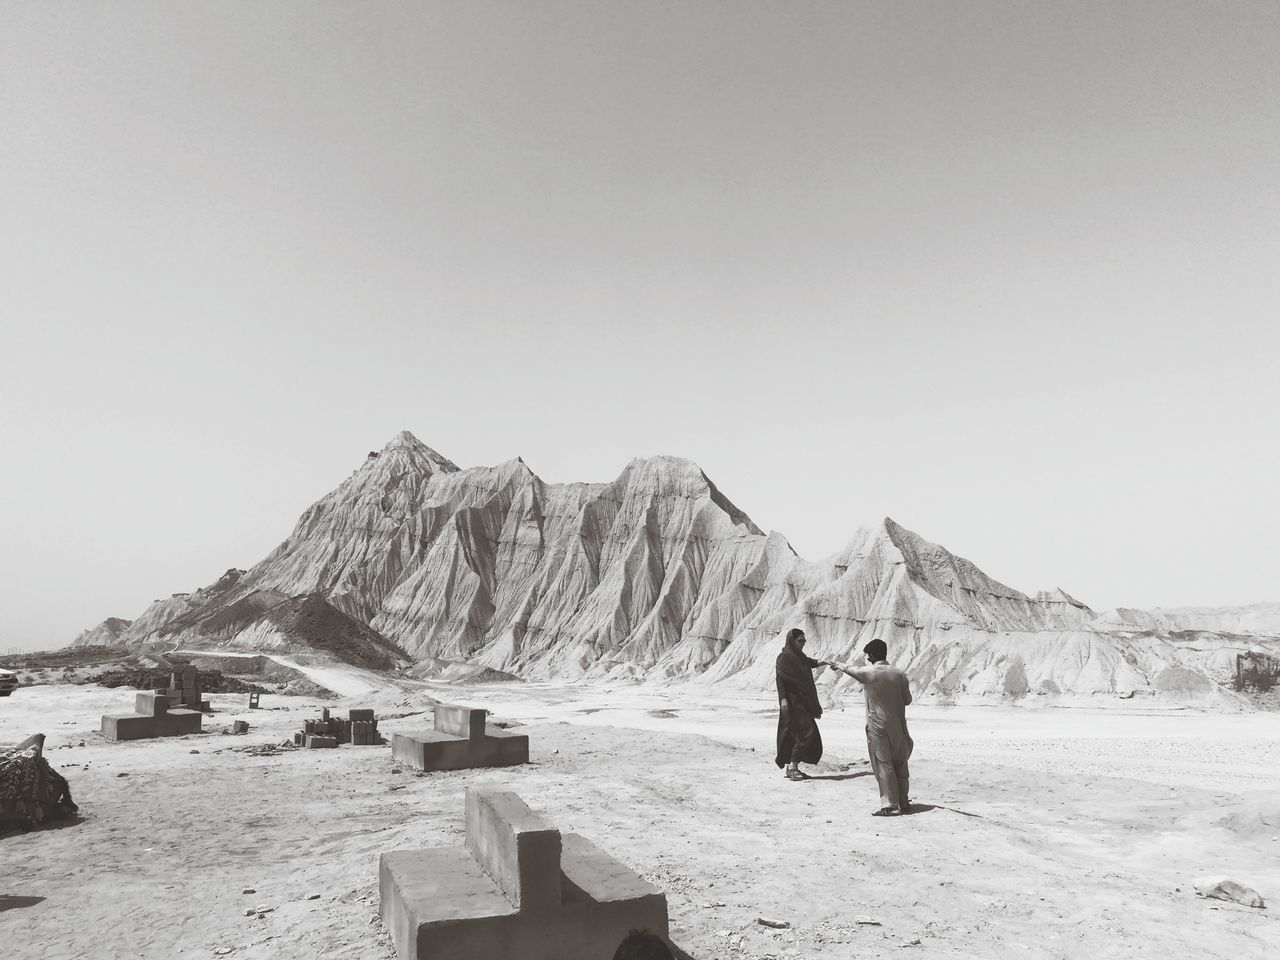 People standing at desert